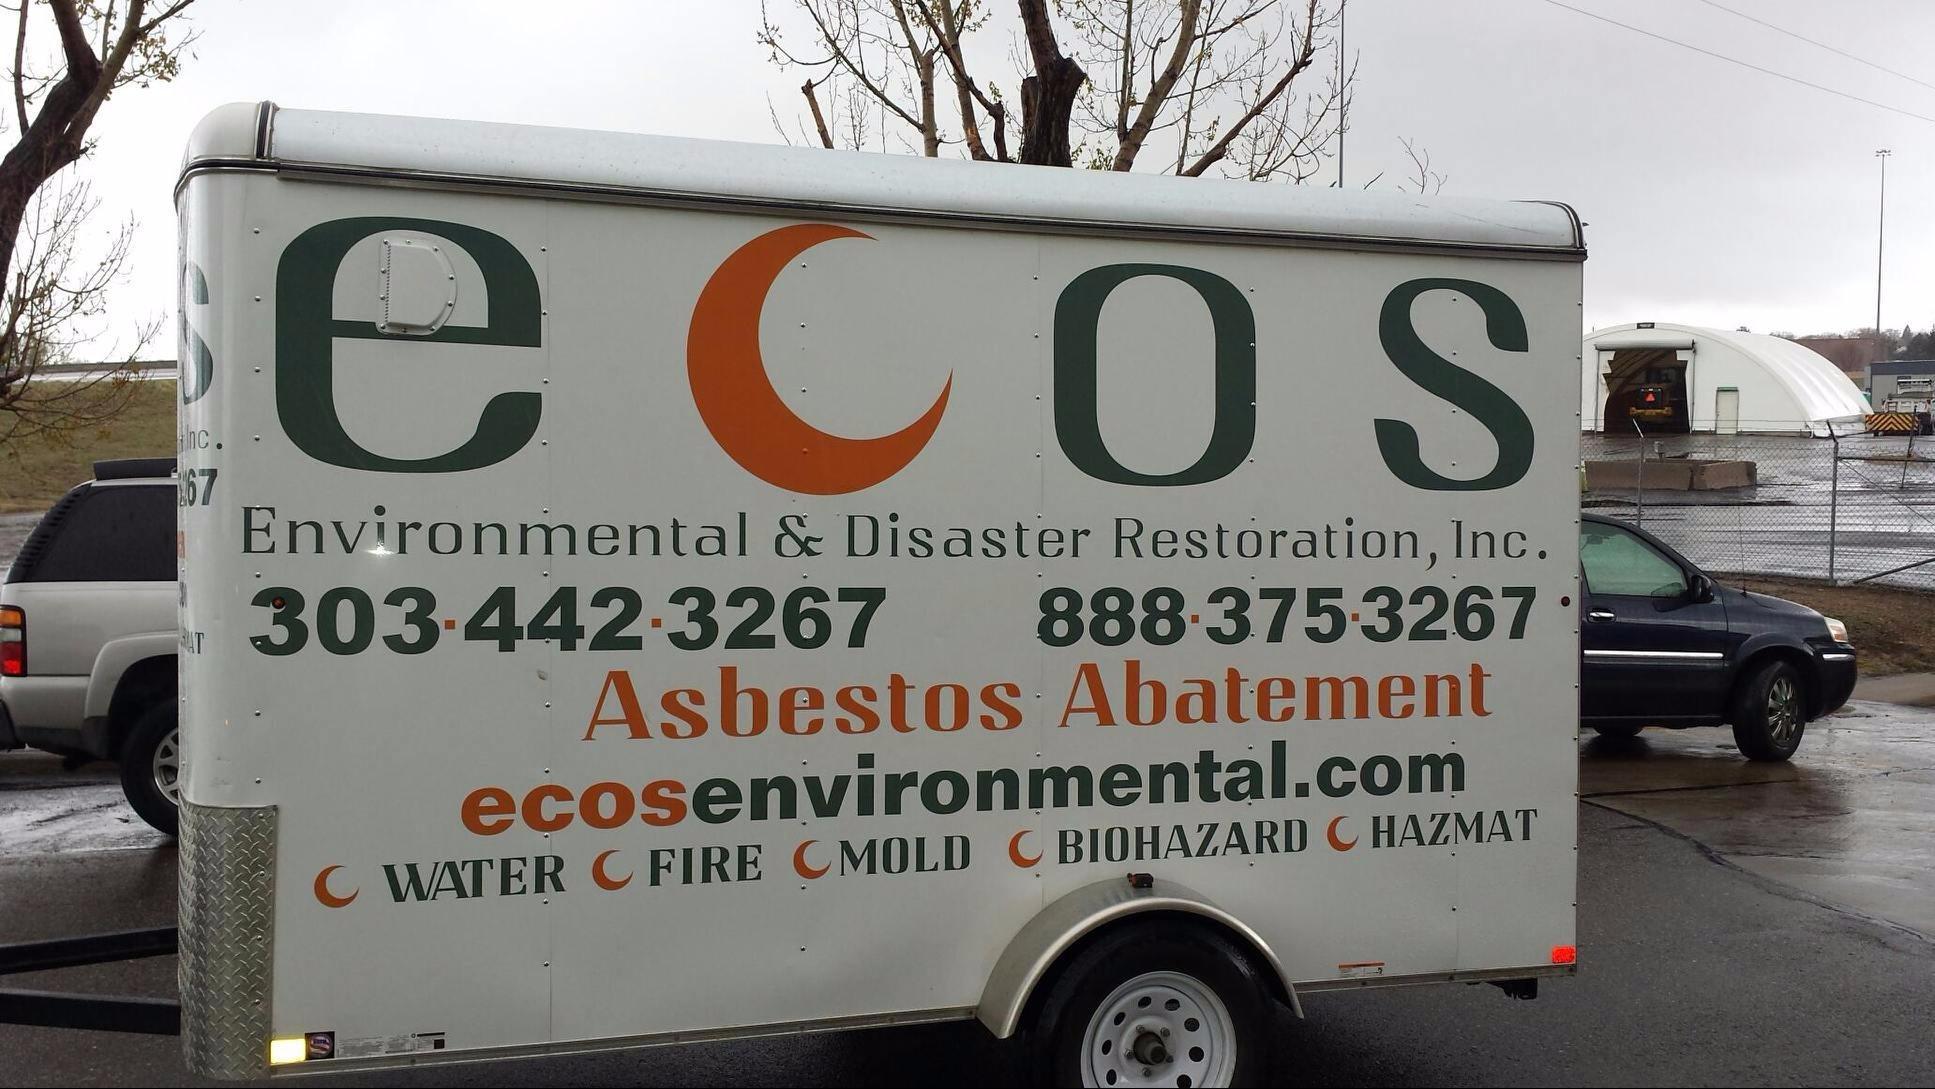 ECOS Environmental & Disaster Restoration, Inc. image 9